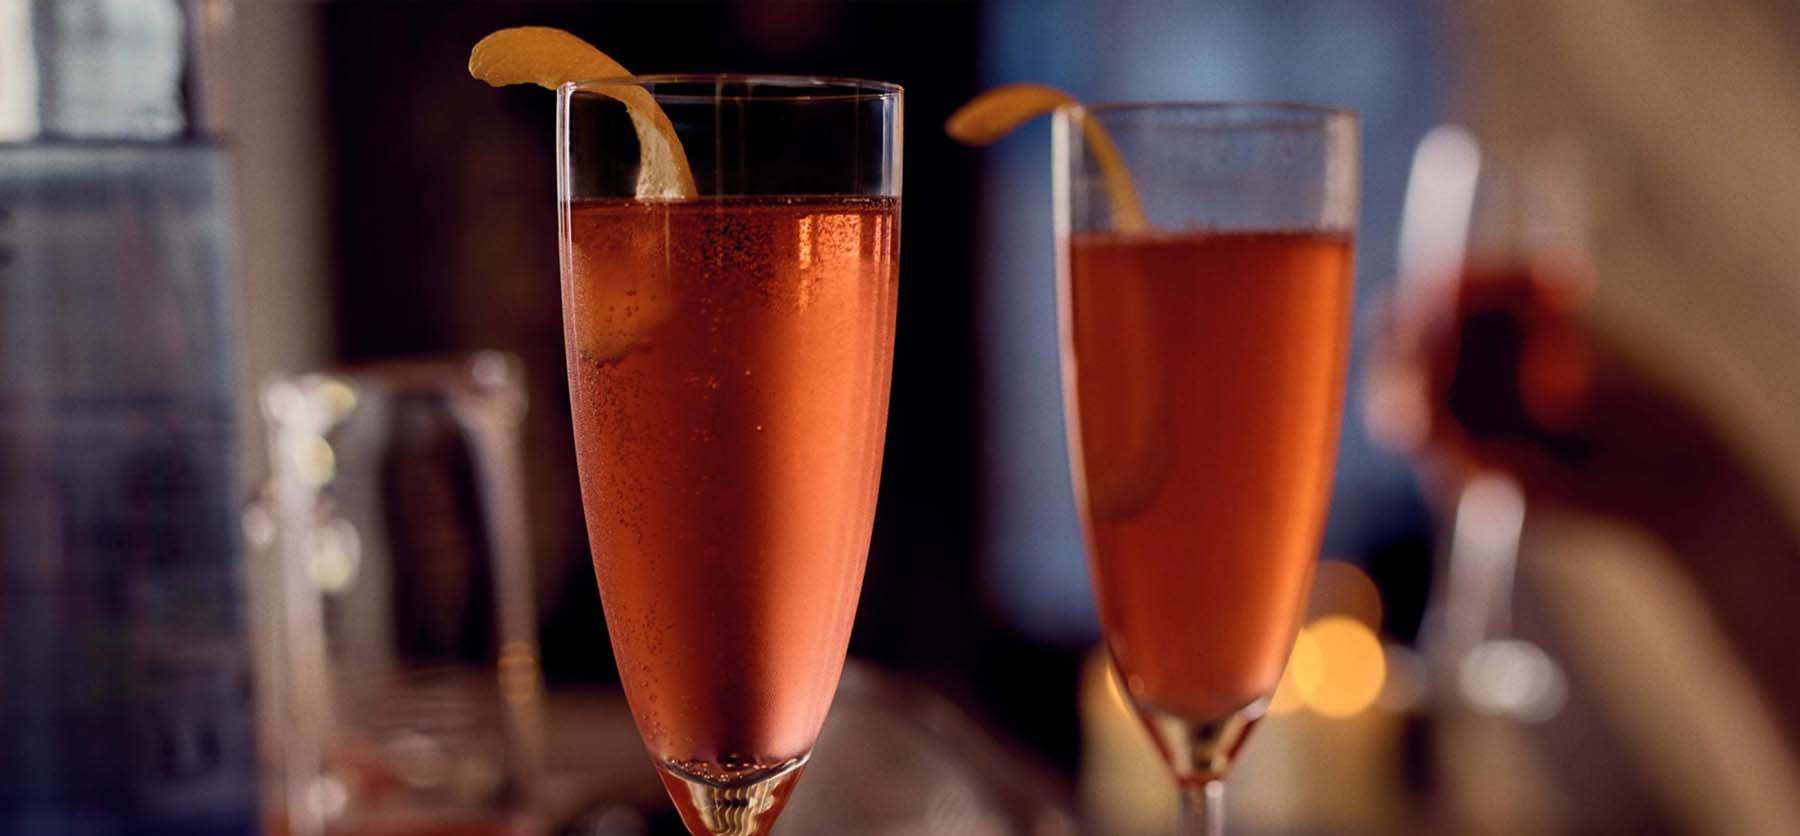 Top 10 dos cocktails de natal